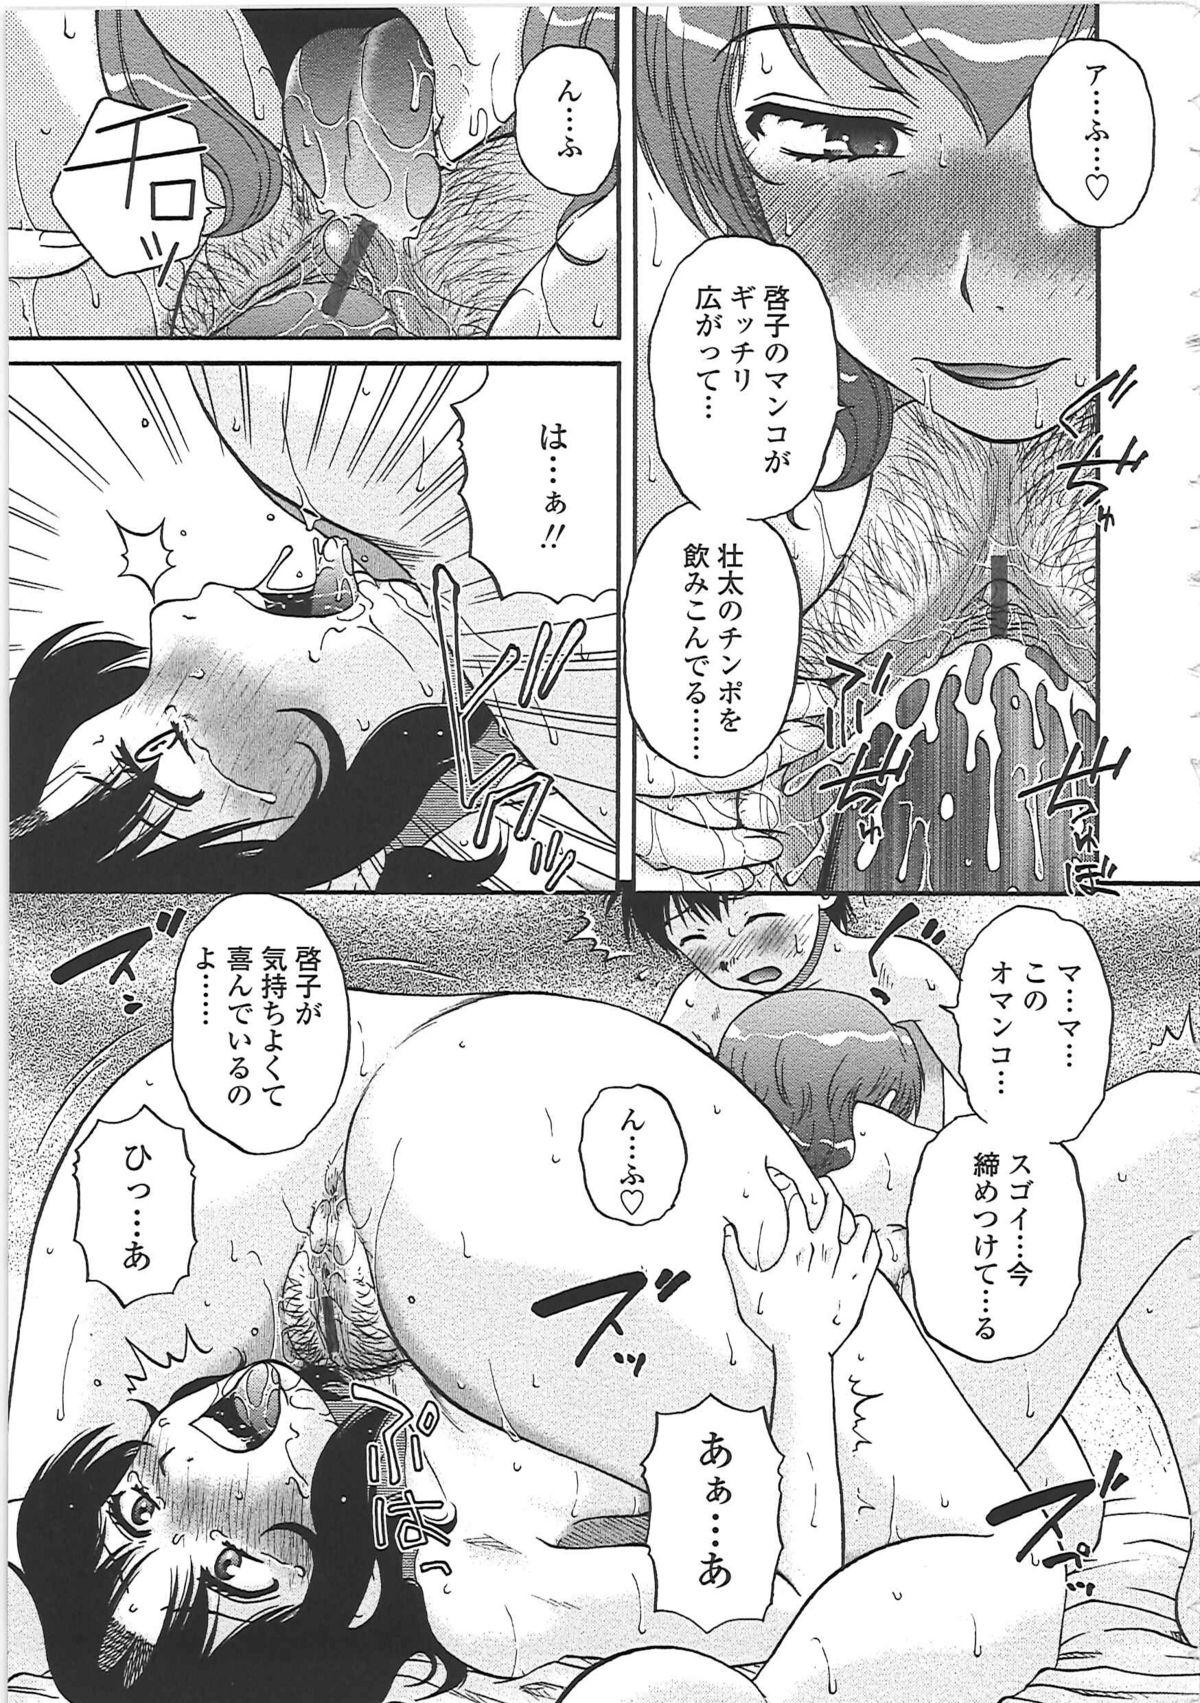 Nikuzuma Tsuushin - Erotic Wife Communication 41